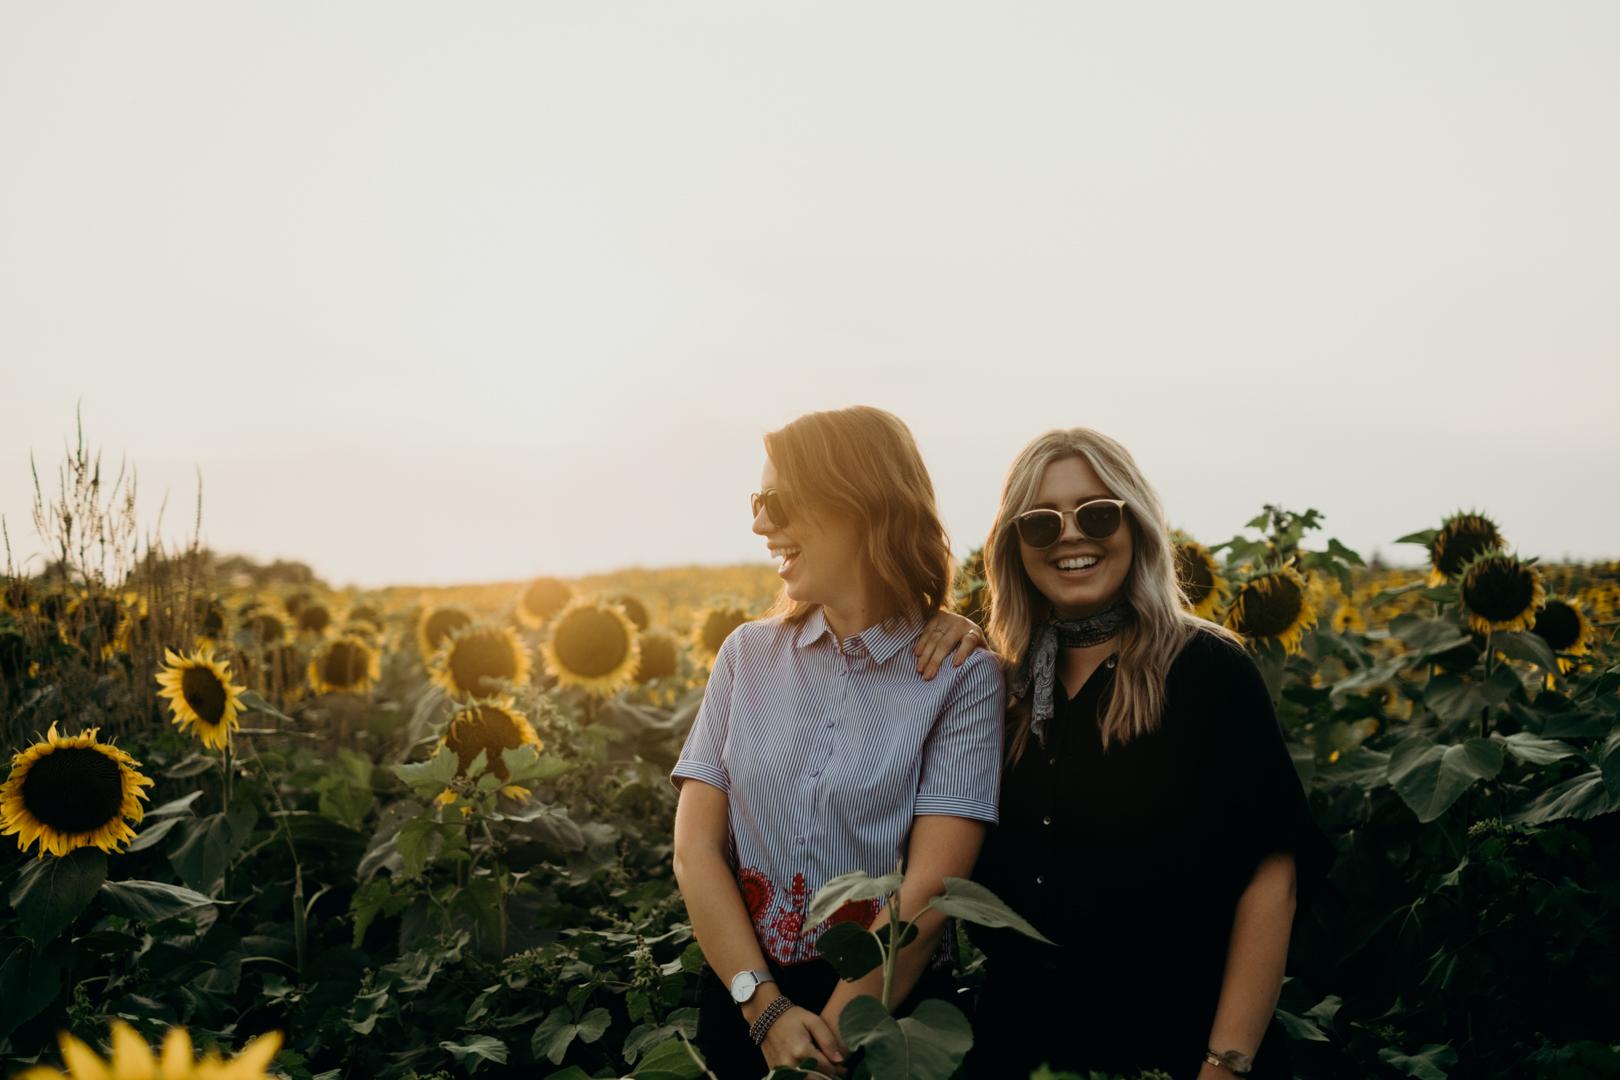 20170909_Grinters Farms Sunflower Fields Lawrence Kansas__21.jpg